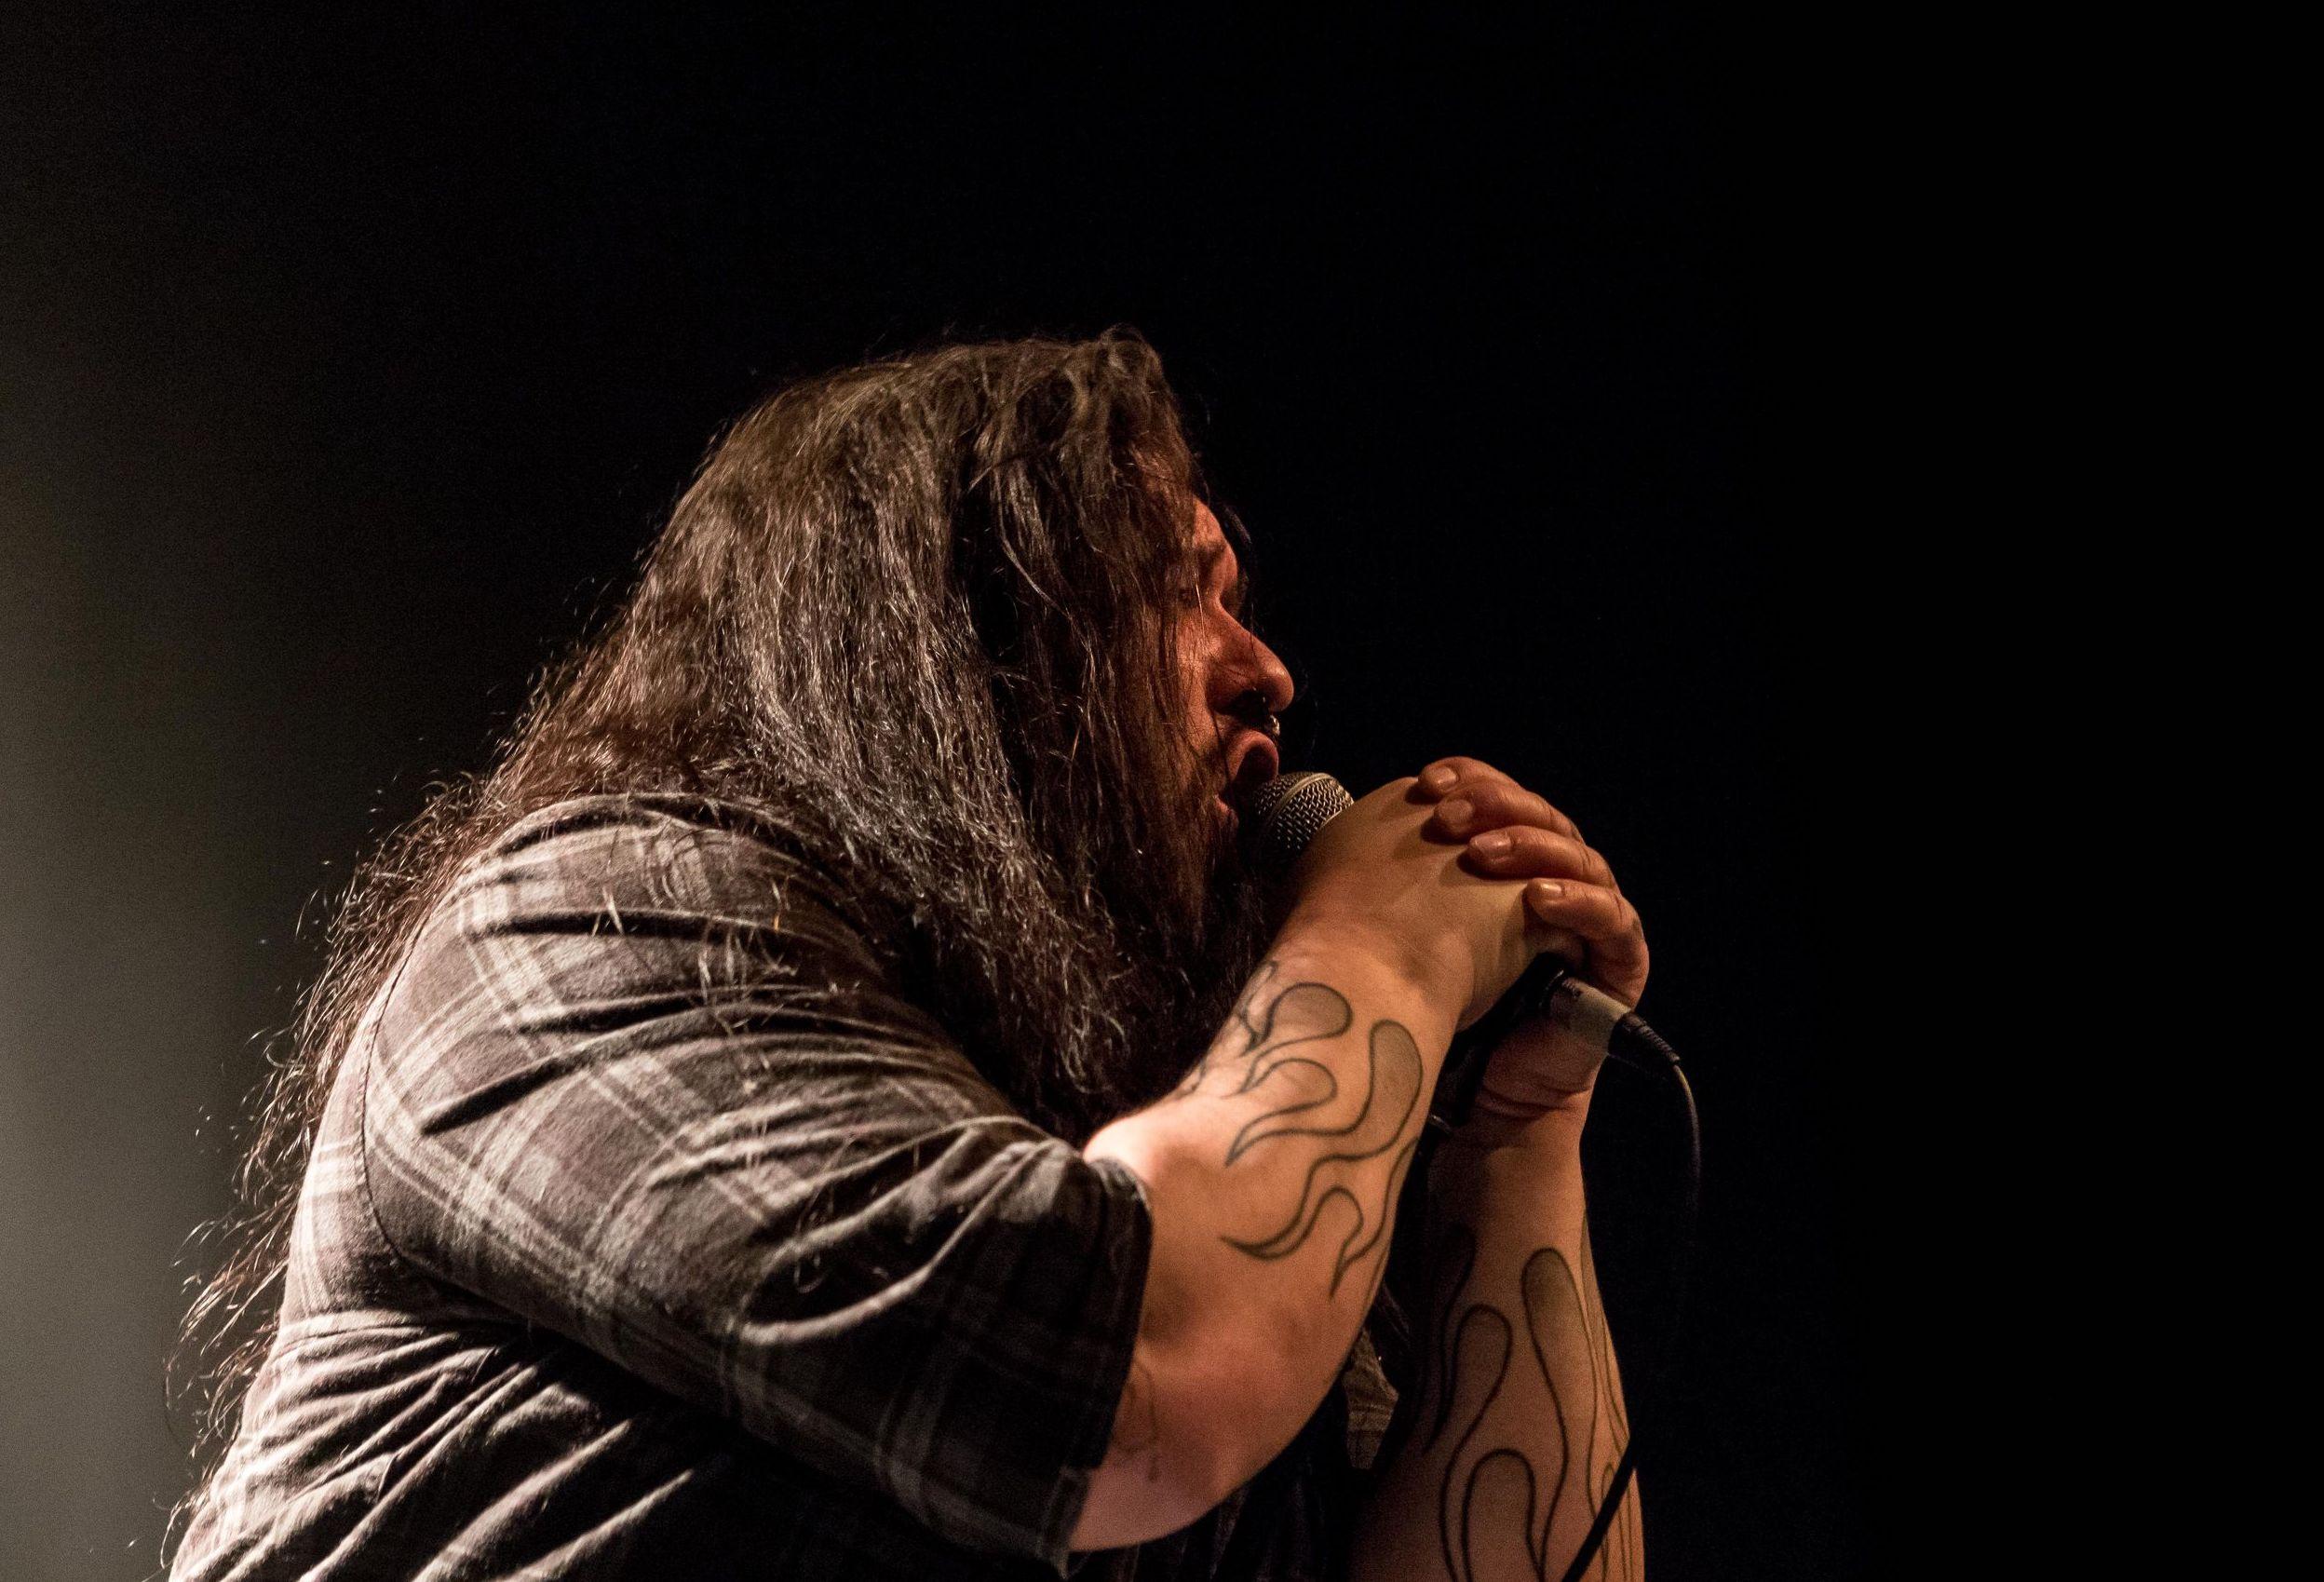 the-very-end-live-zeche-carl-essen-germany-thrash-metal_9